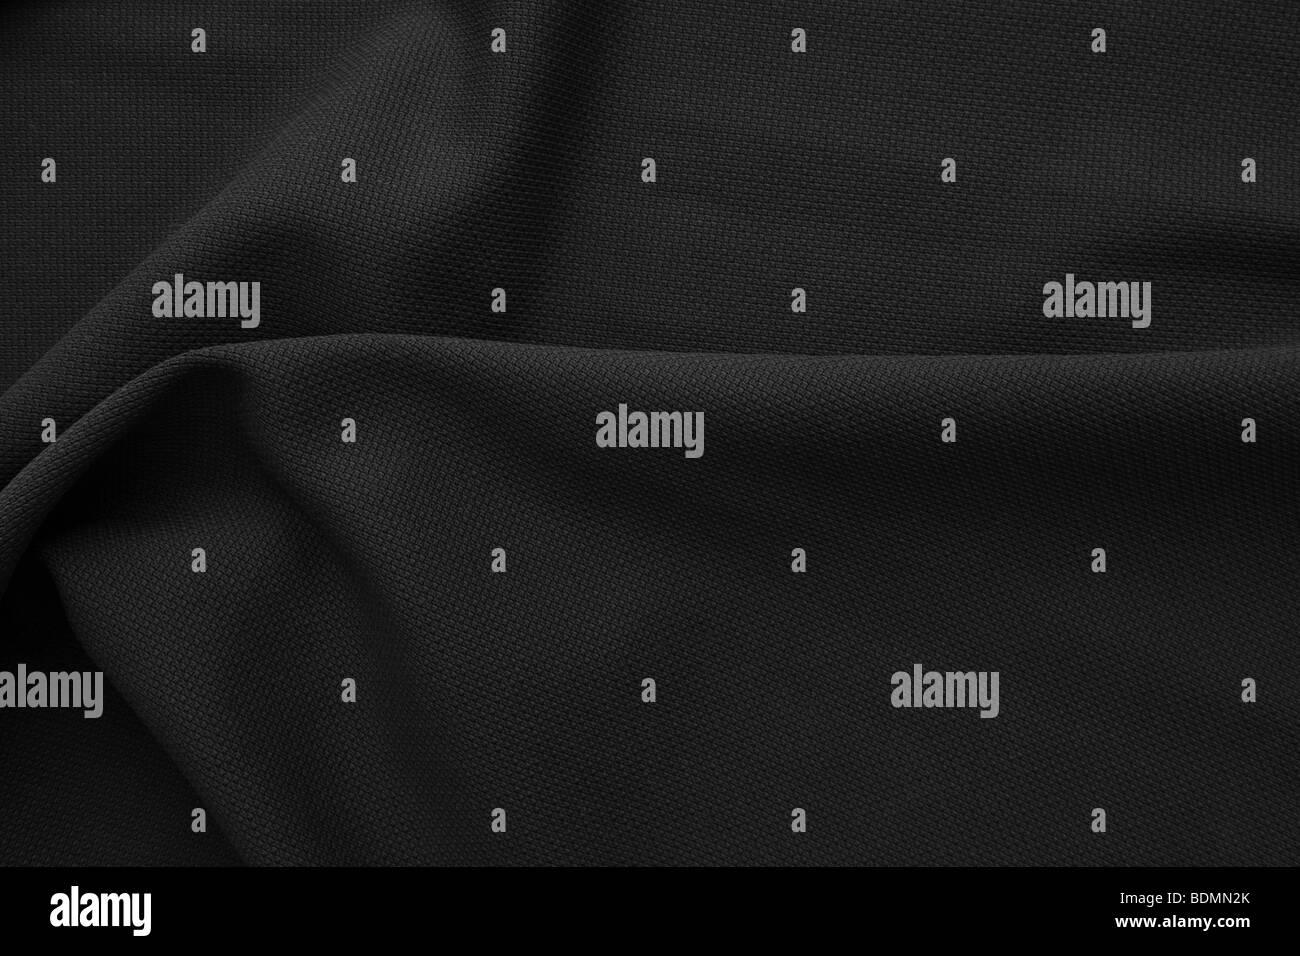 black fabric - Stock Image